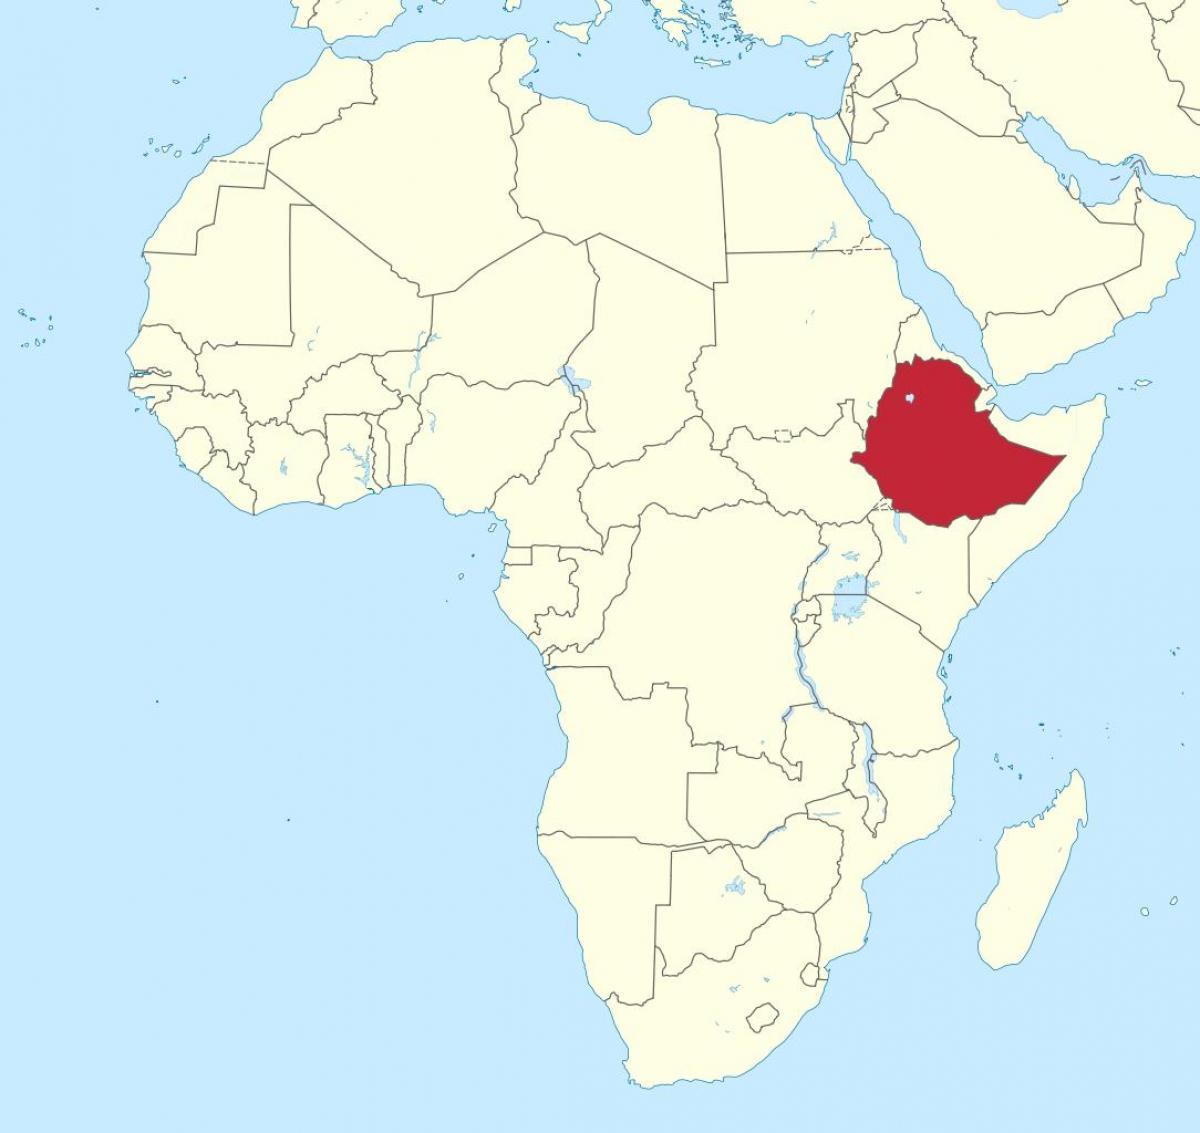 etiopia kart Etiopia kart afrika   Kart over afrika som viser Etiopia (Øst  etiopia kart